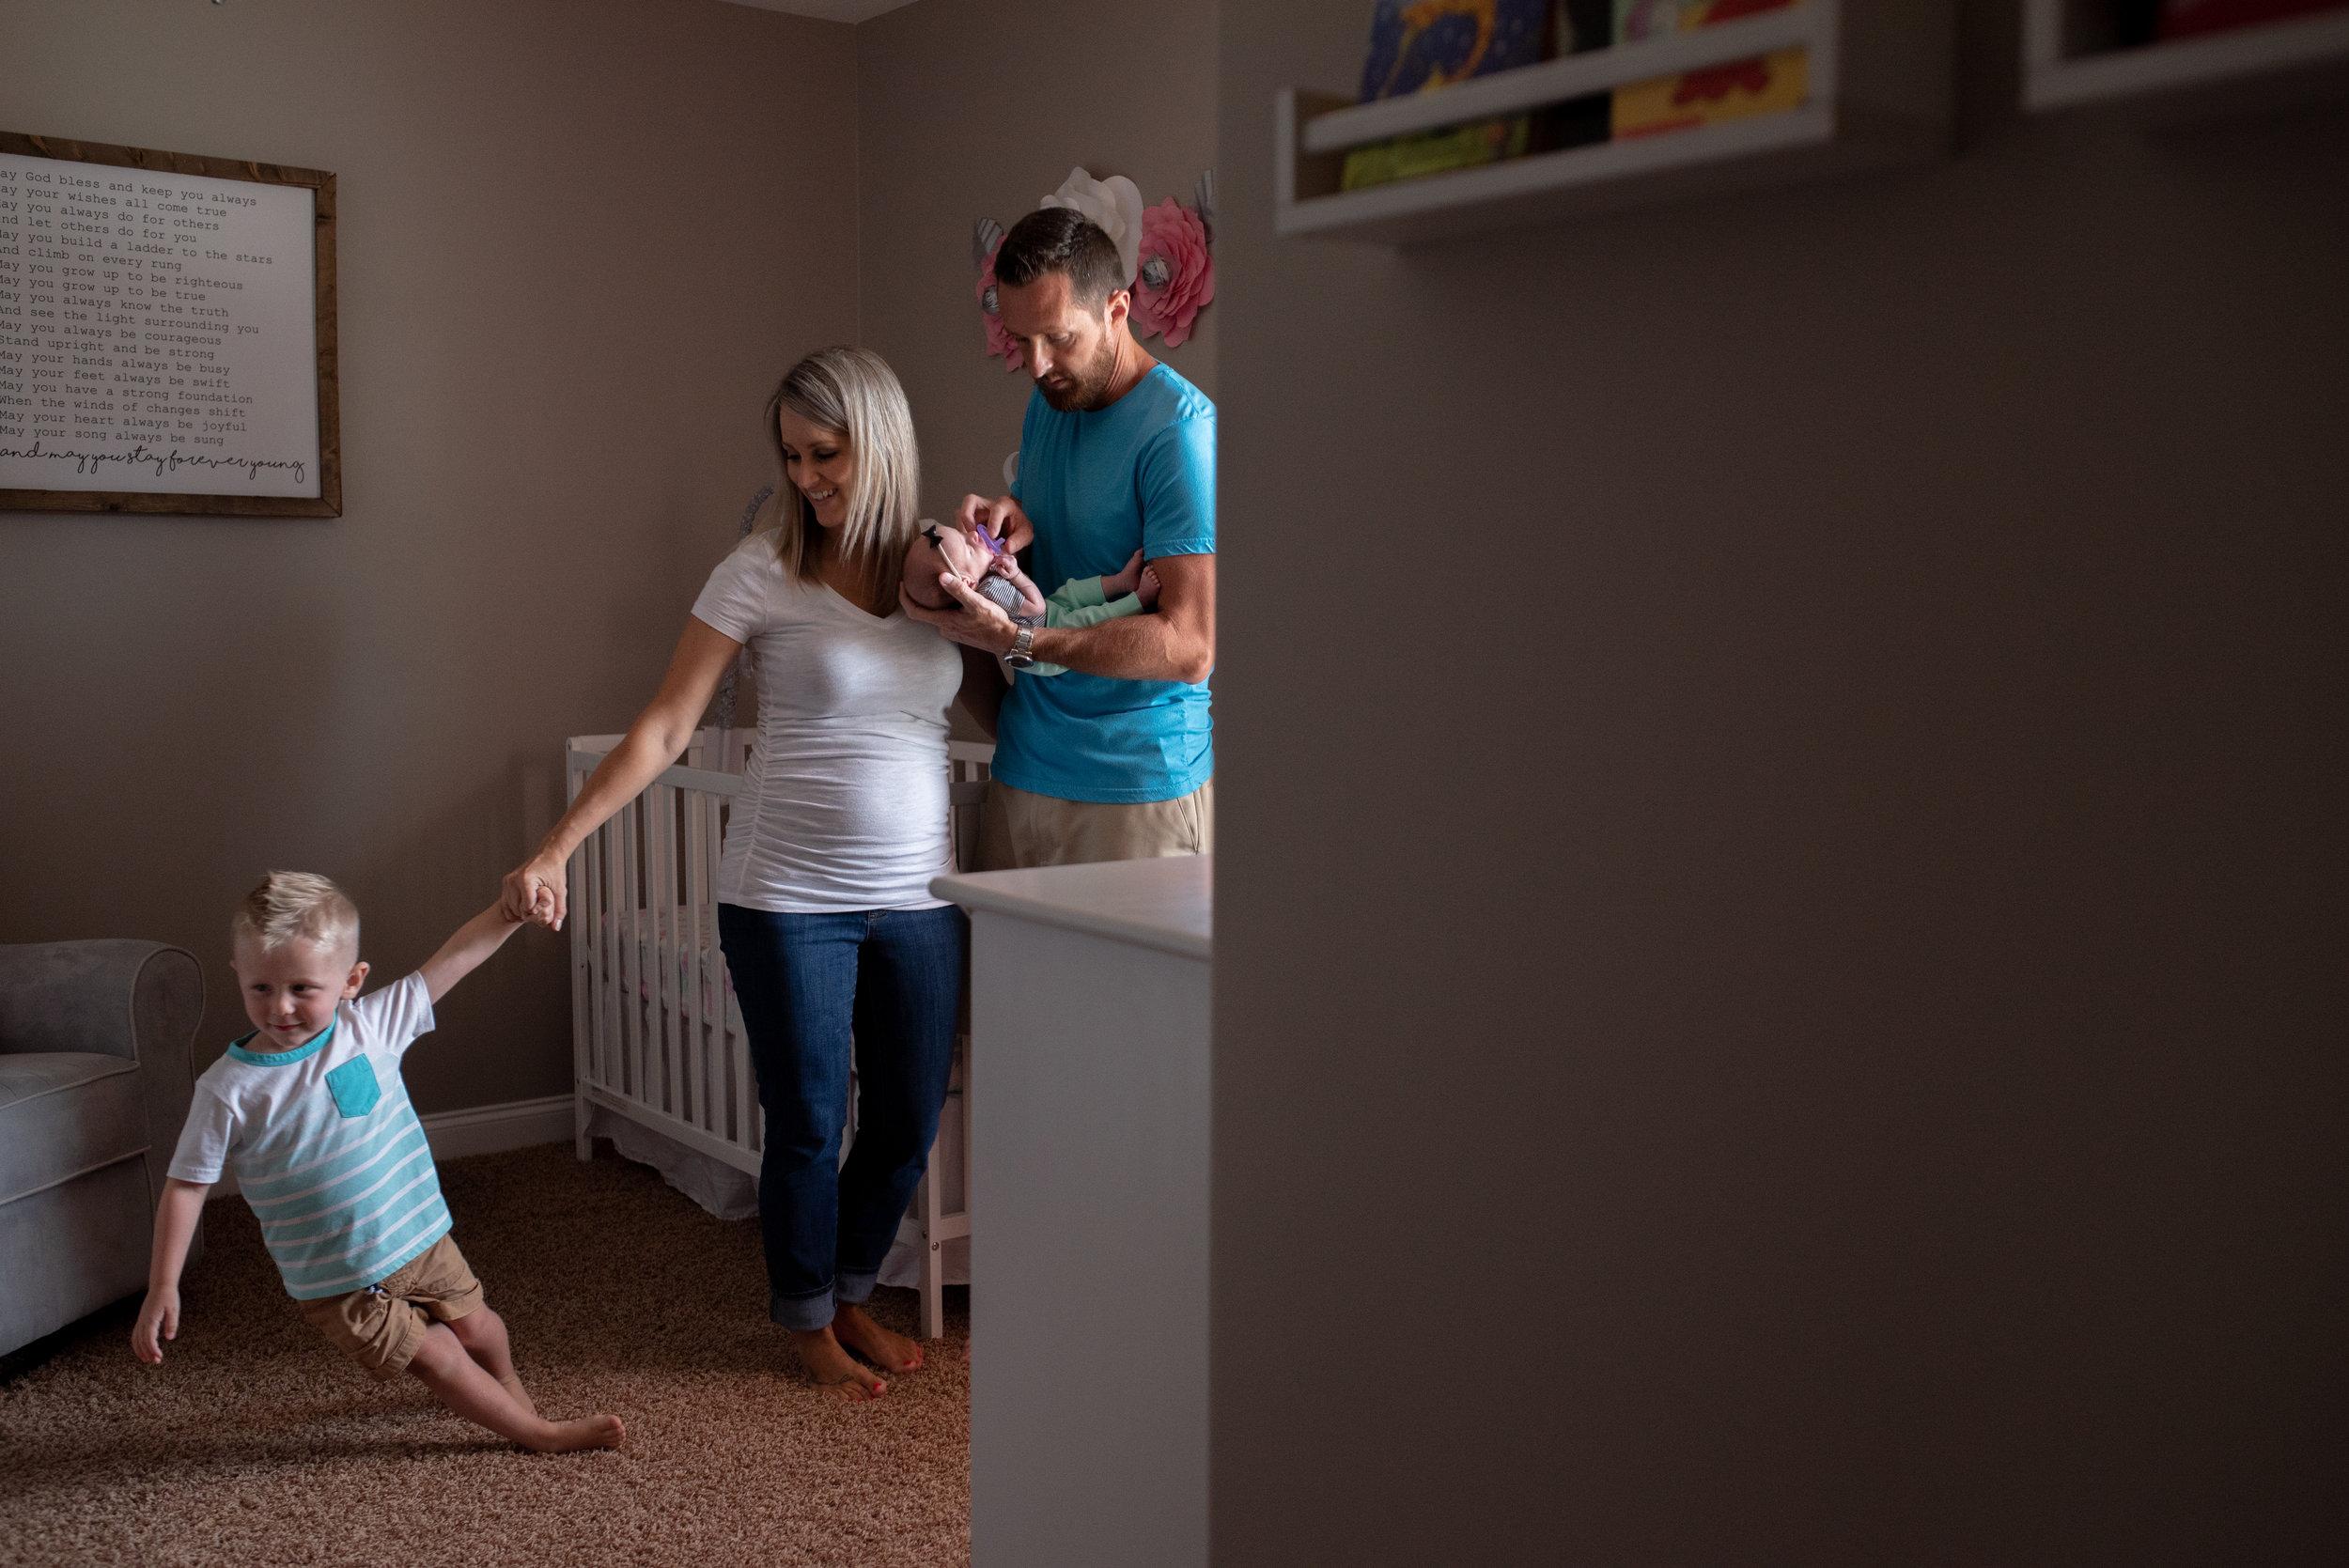 Bear Creative Company, Ohio Photographers, Lifestyle Session, Family Session, In Home Session, Columbus Ohio Photographers